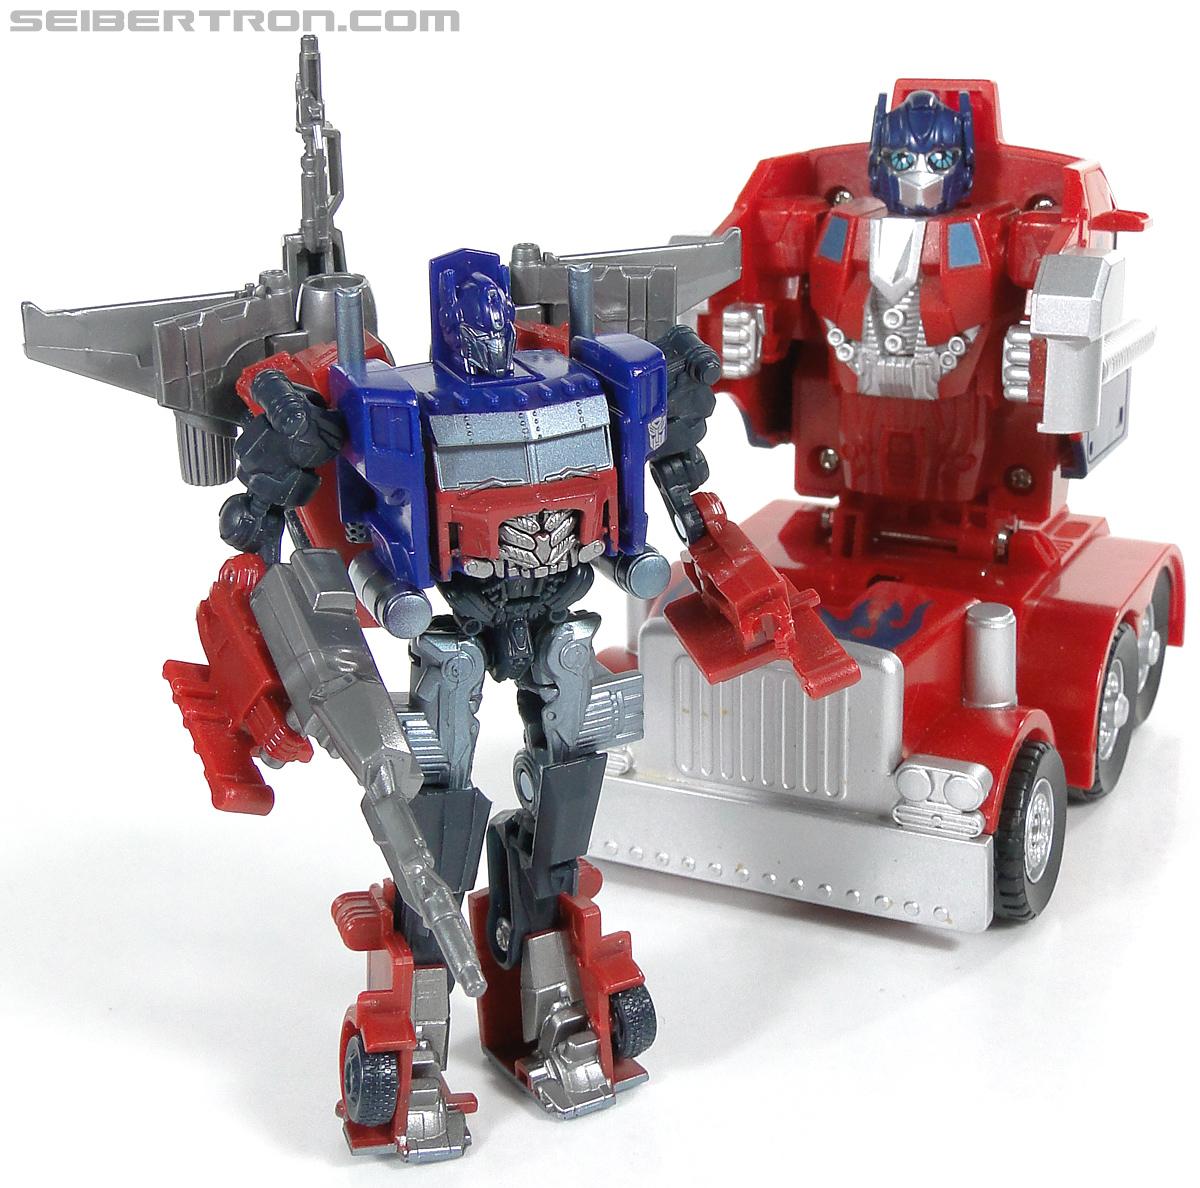 Transformers Dark of the Moon Optimus Prime (Image #214 of 235)